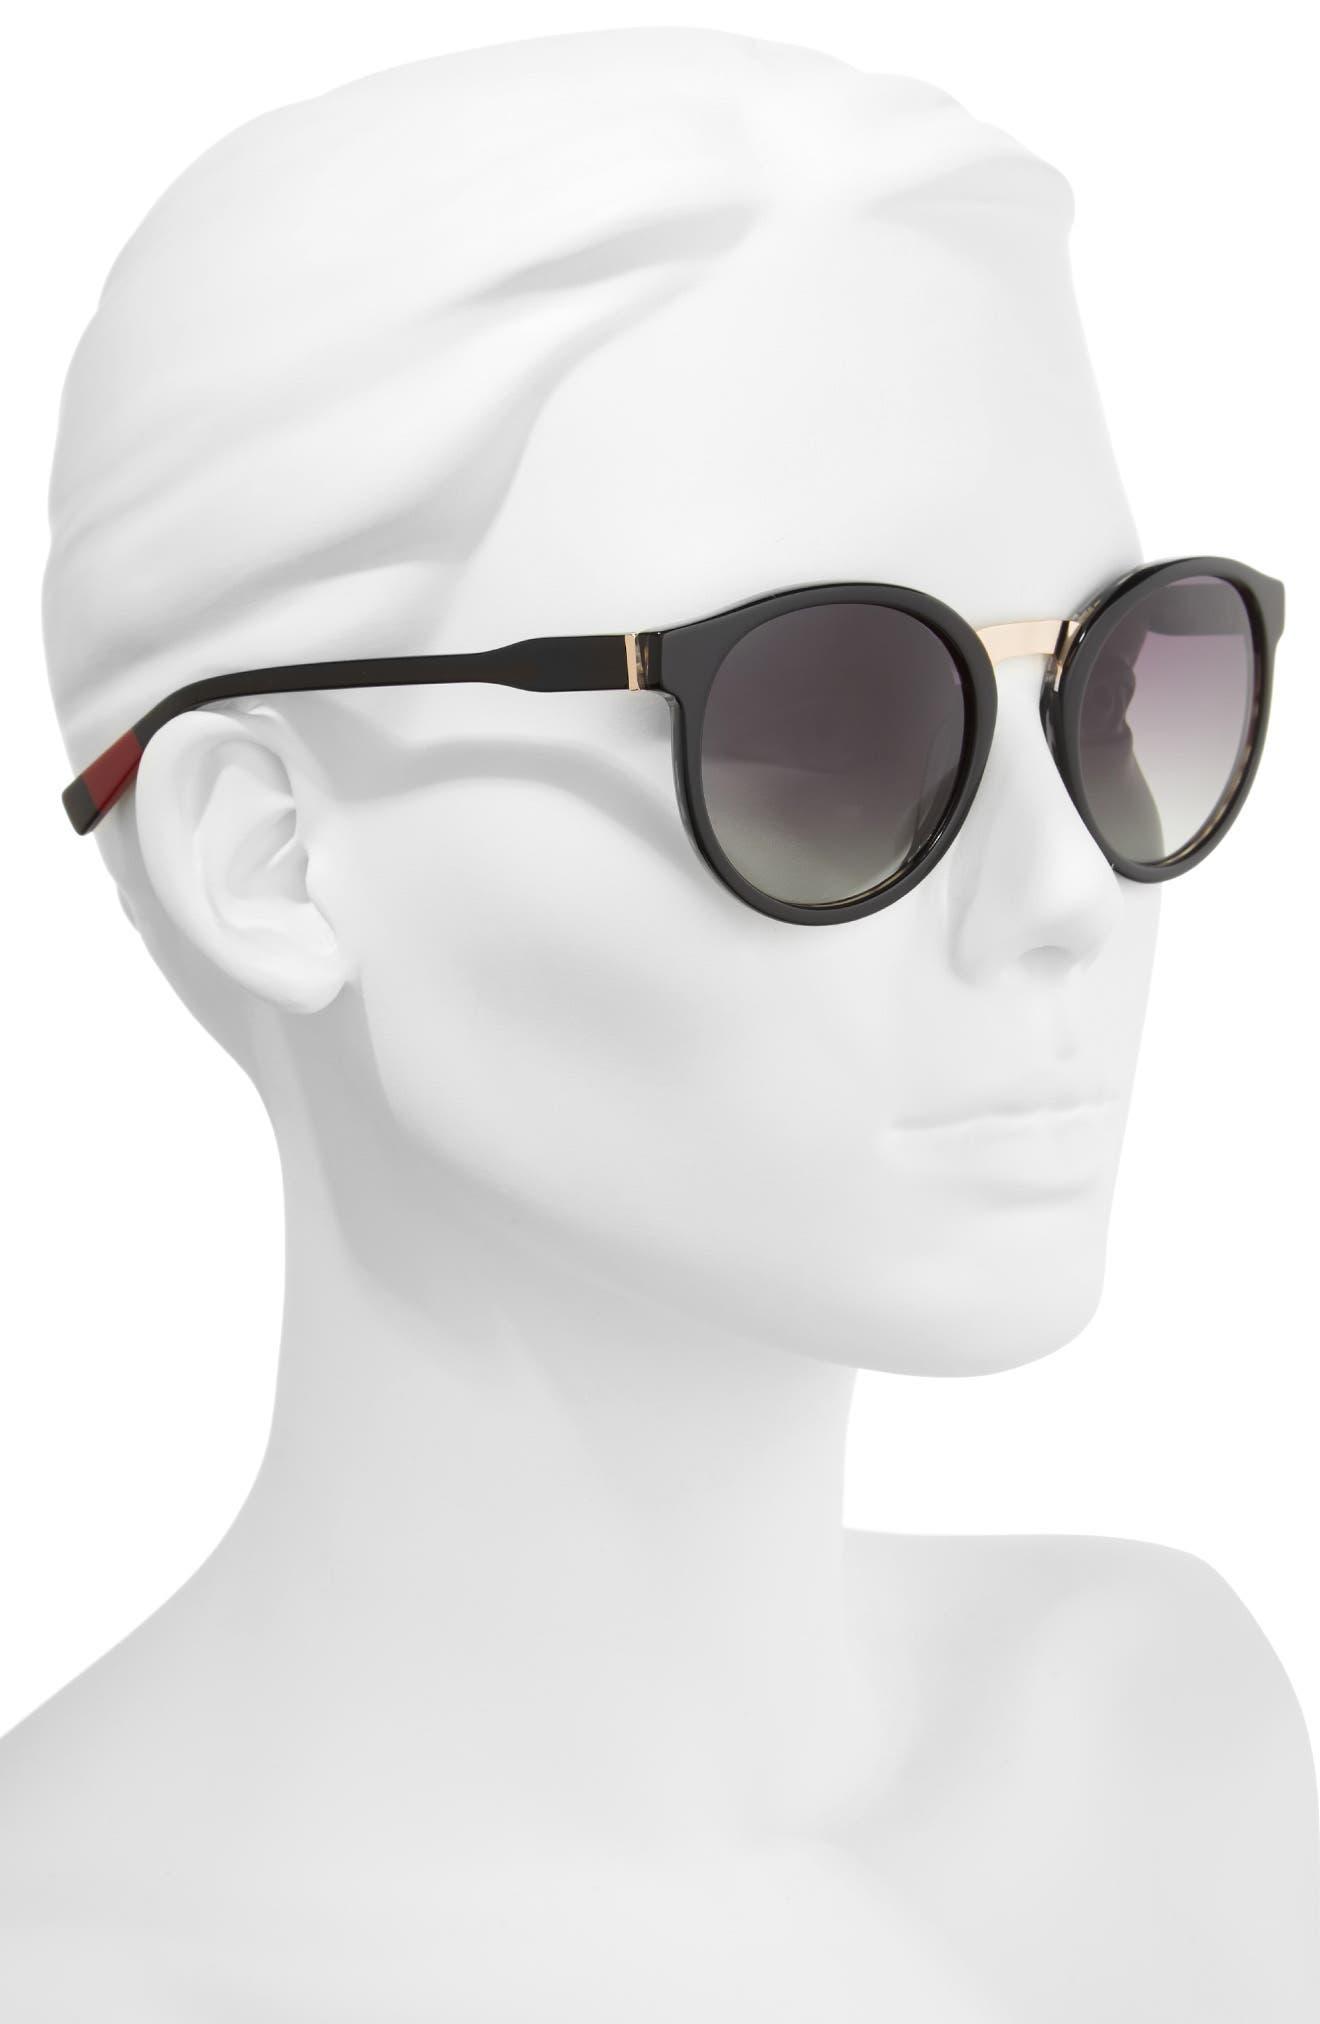 53mm Round Sunglasses,                             Alternate thumbnail 5, color,